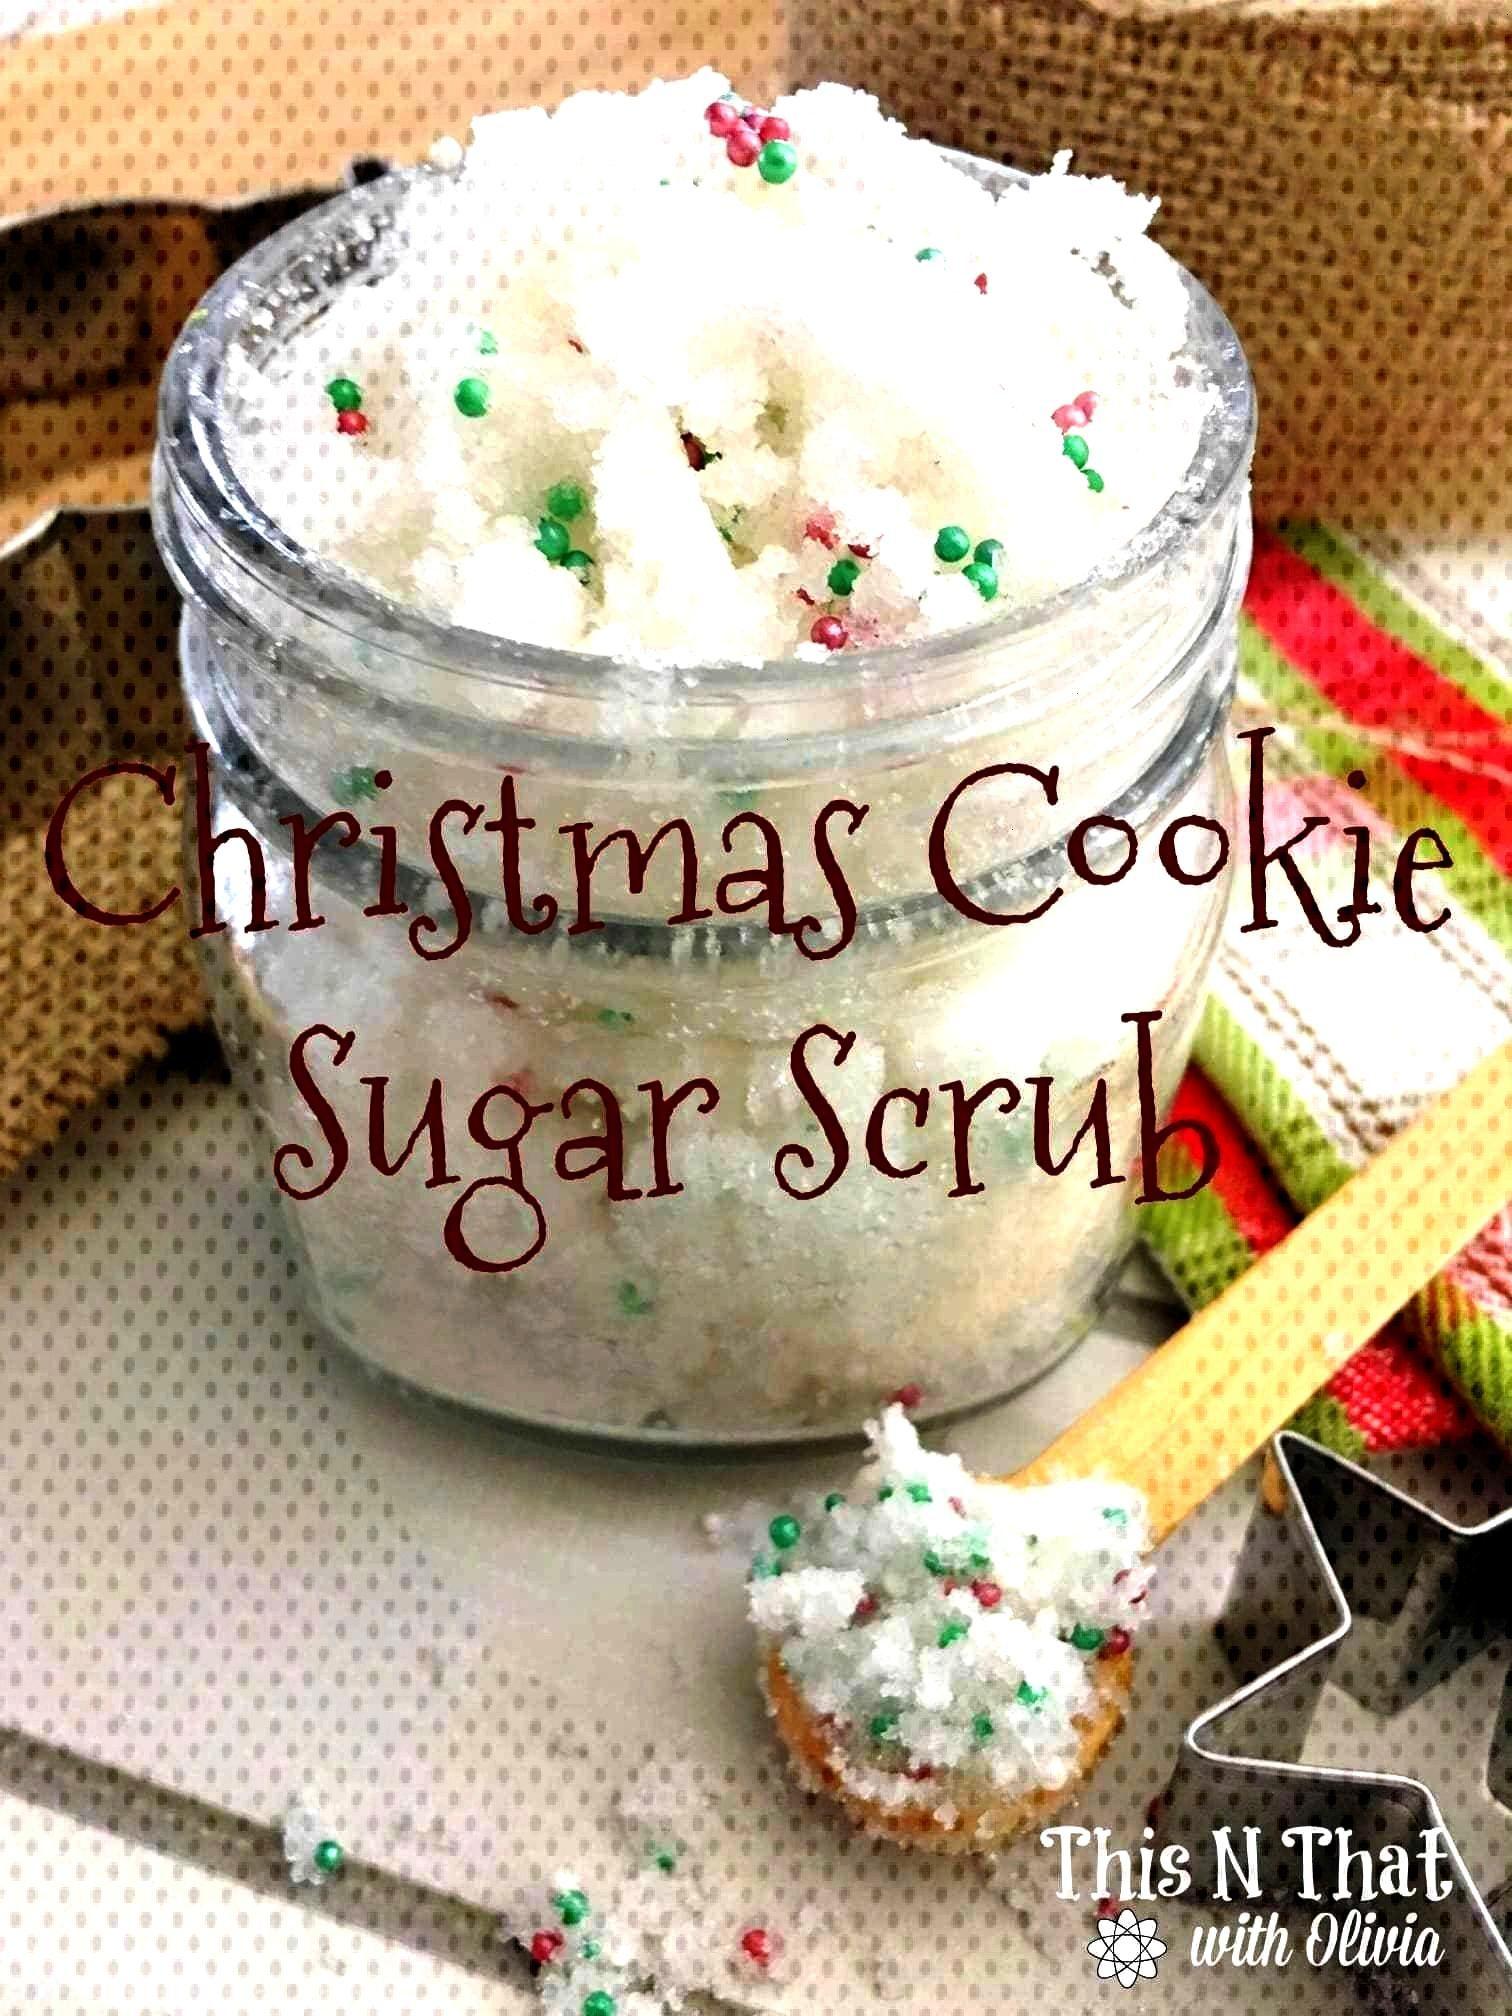 Cookie Sugar ScrubChristmas Cookie Sugar Scrub Bath Soaks 4 Ways // Make me, indeed! Amy shares g